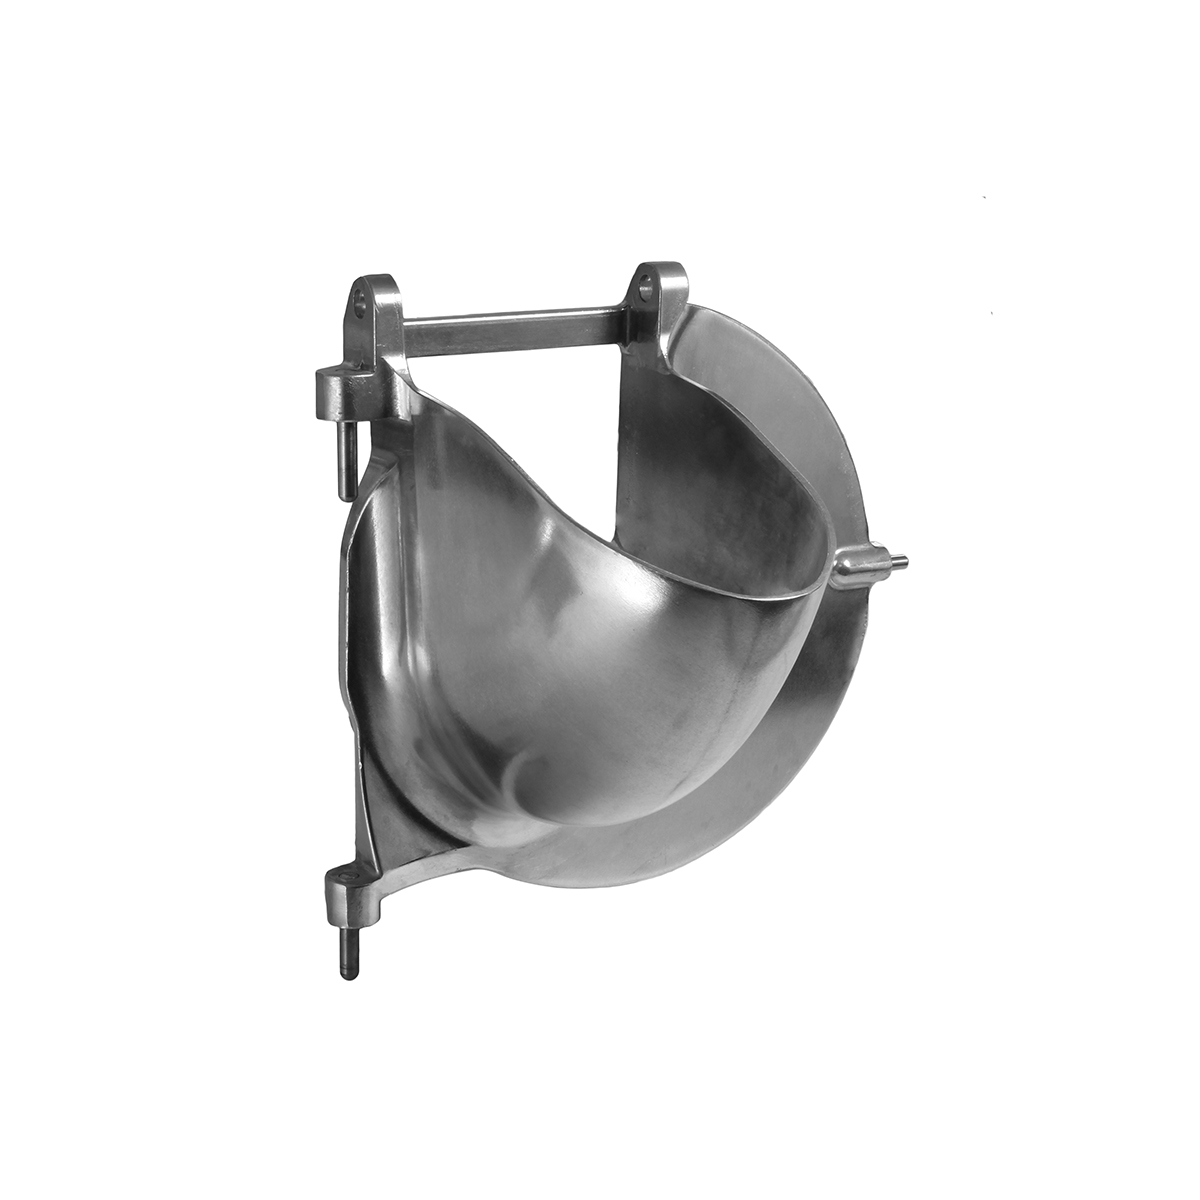 Kitchenaid 6 Quart Mixer Parts kitchenaid hand mixer parts list | motor replacement parts and diagram